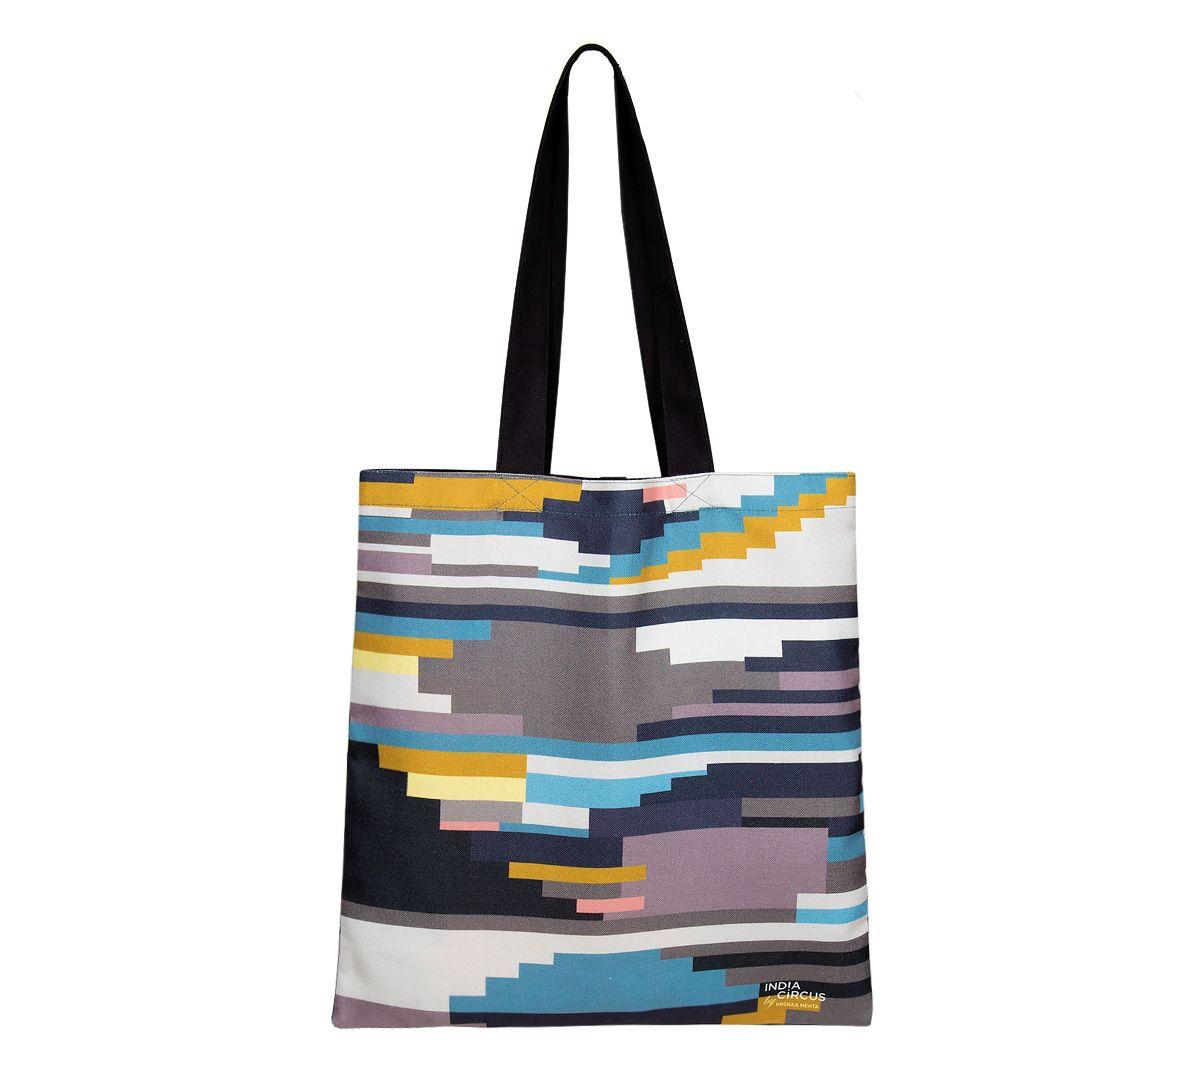 Buy Designer Handbags in India